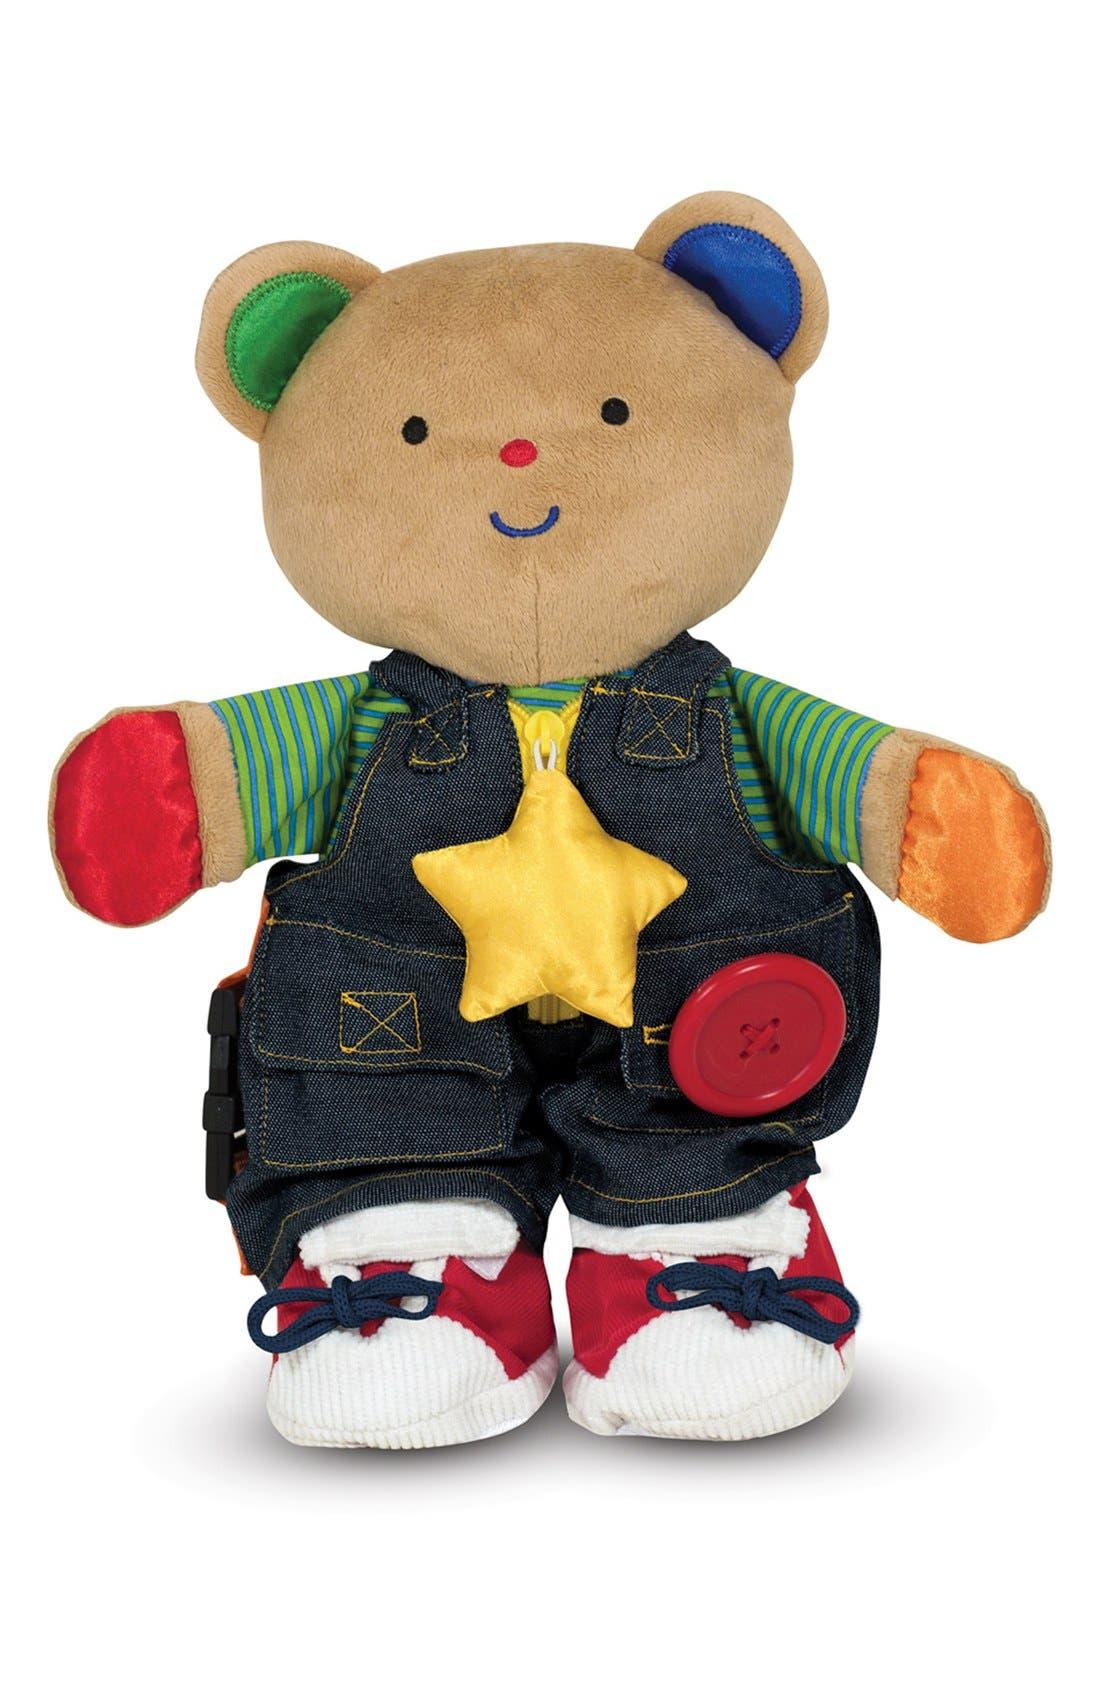 Main Image - Melissa & Doug 'Teddy Wear' Plush Toy